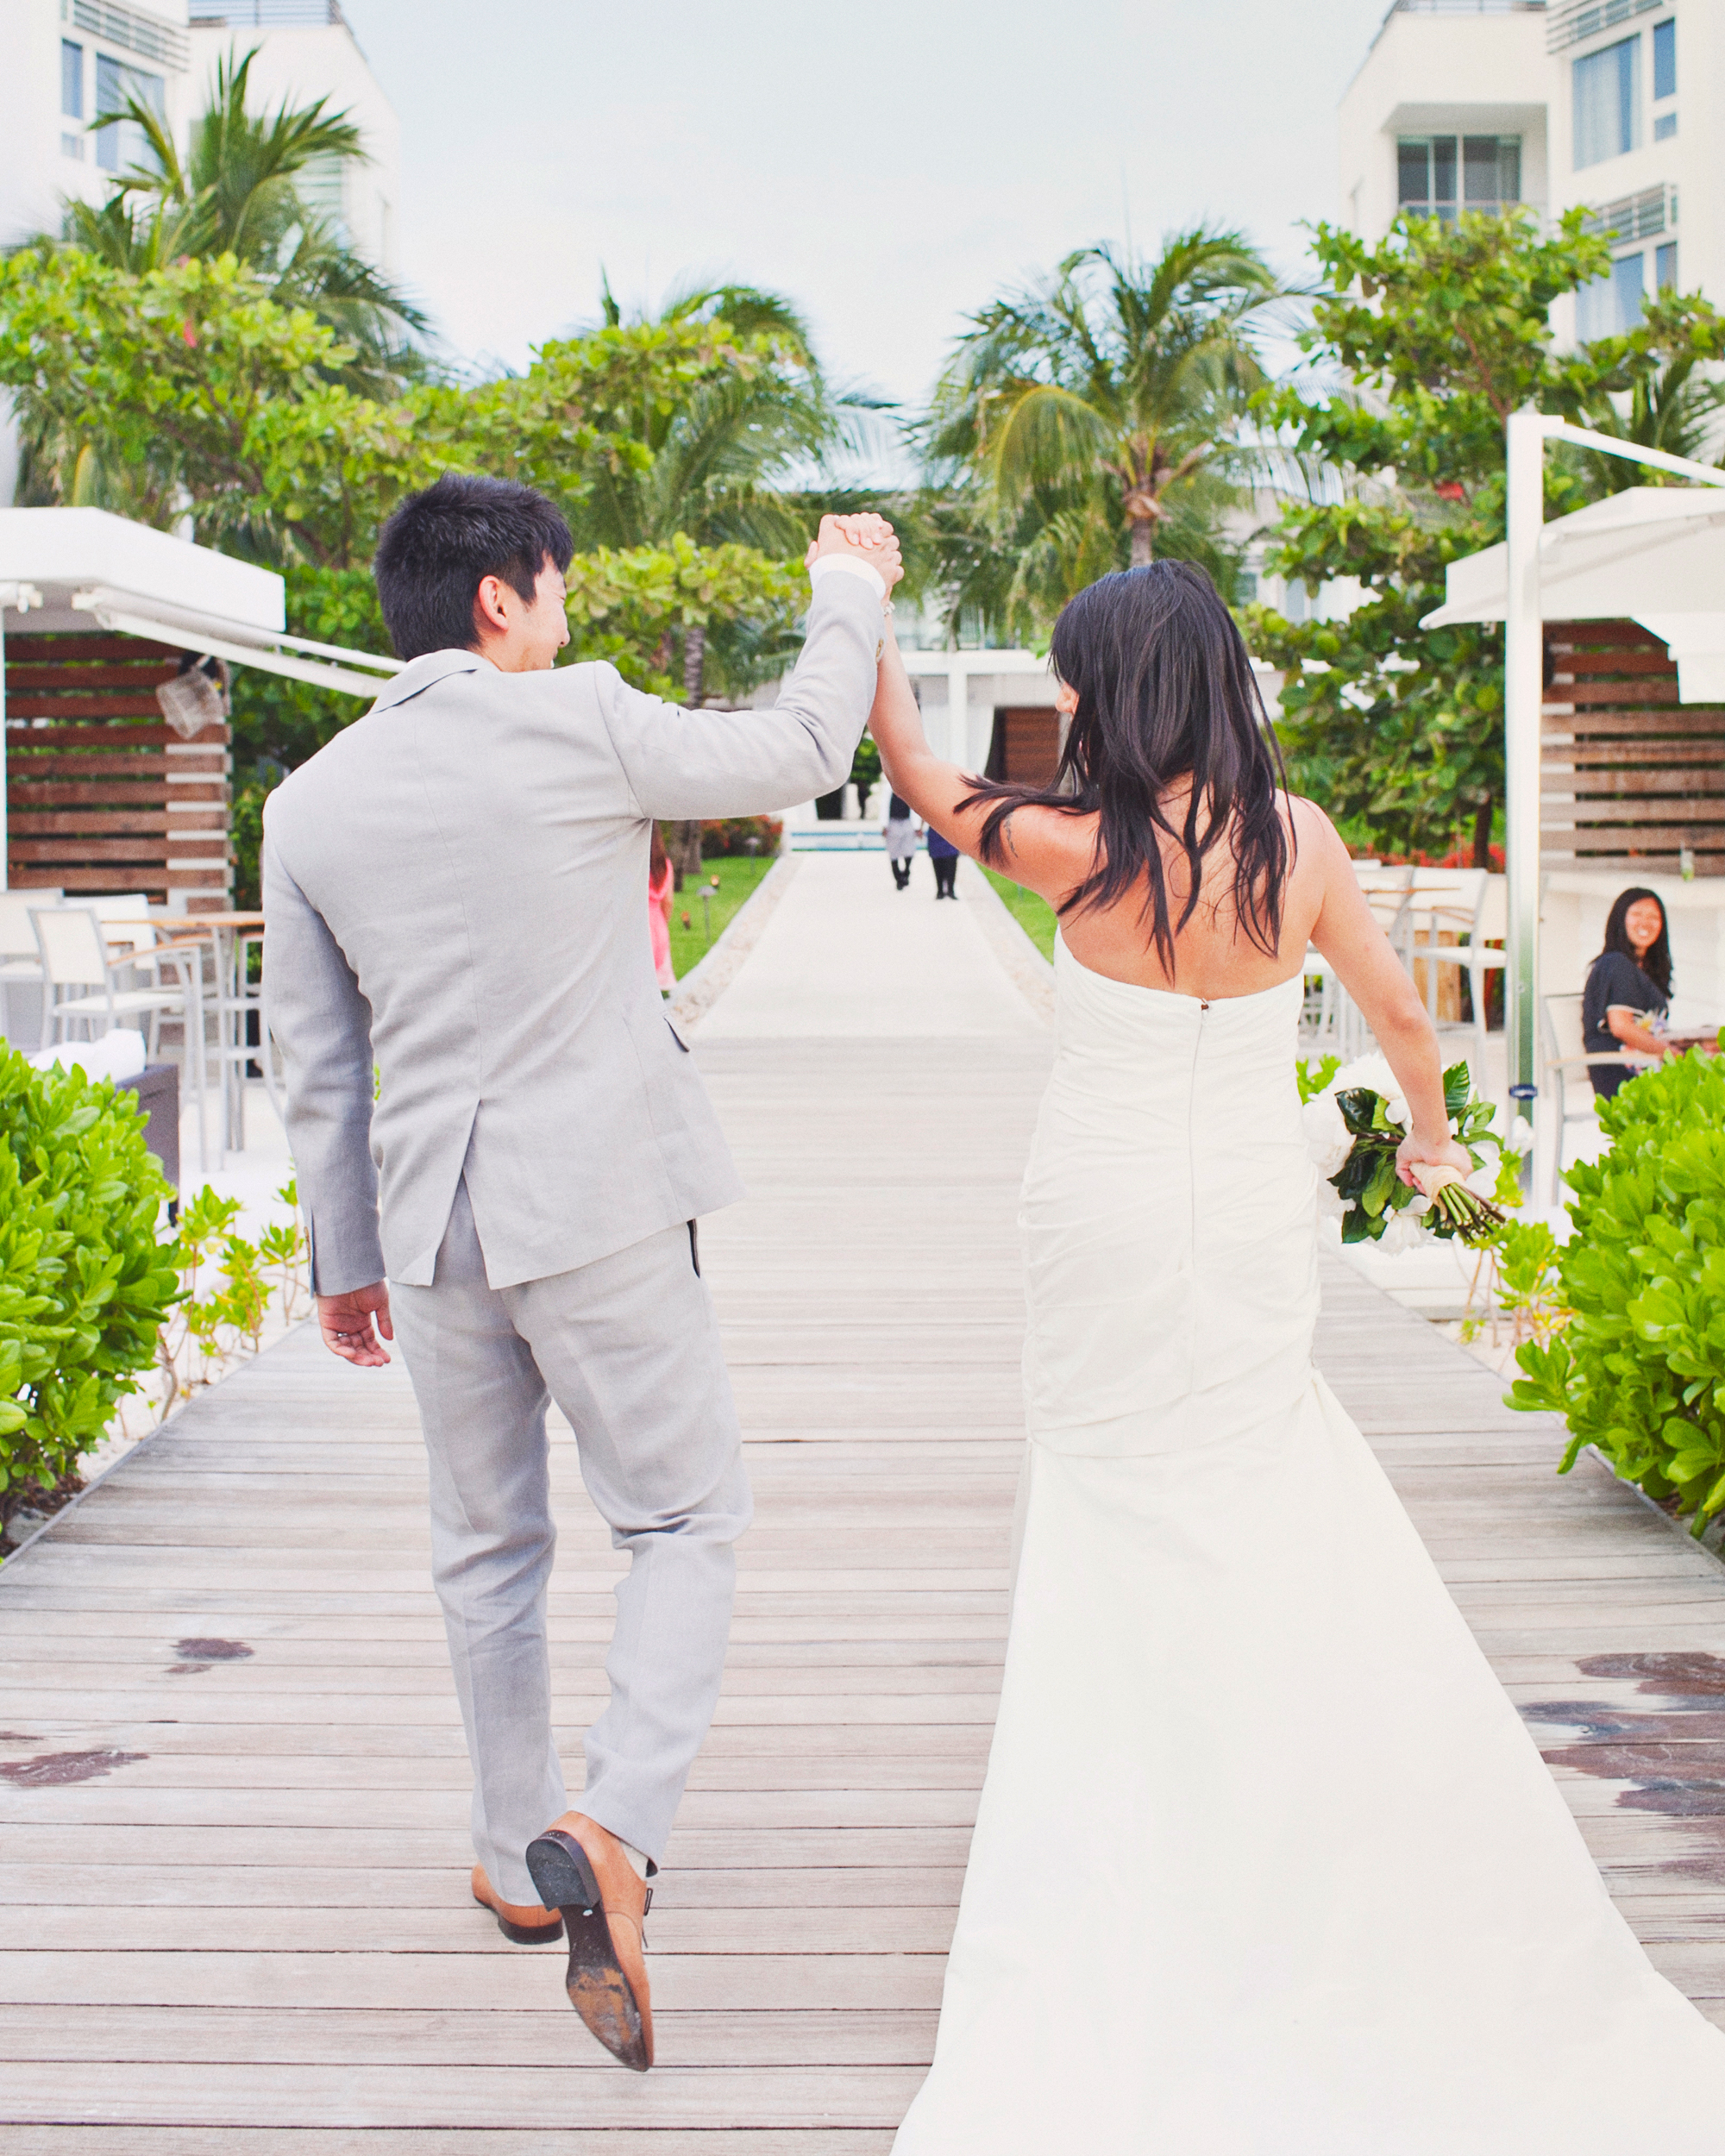 real-weddings-jessica-bobby-0811-365.jpg